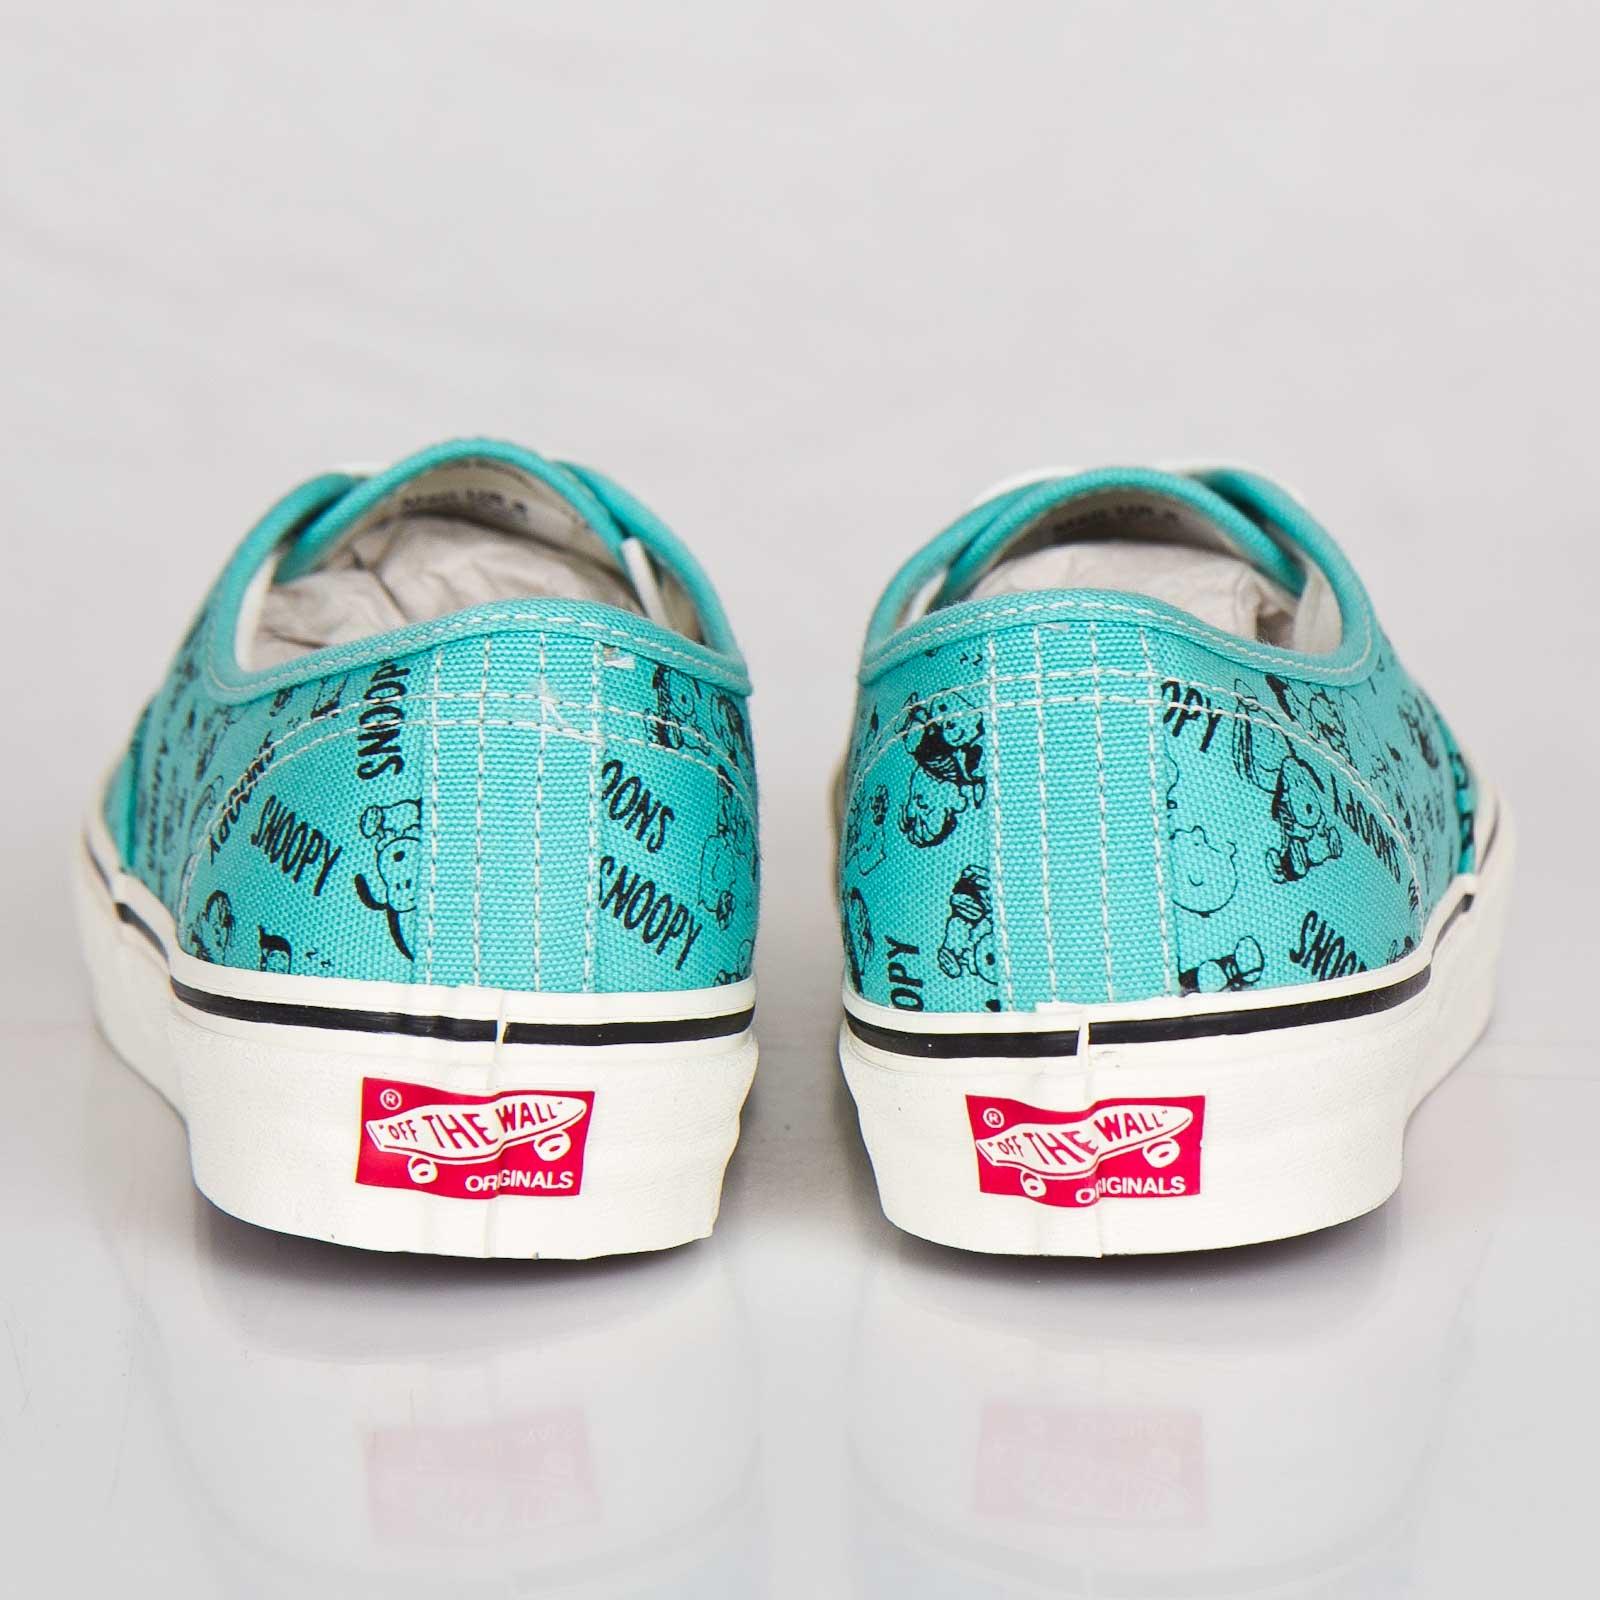 58a6b3fc73 Vans OG Authentic LX - Udddmw - Sneakersnstuff